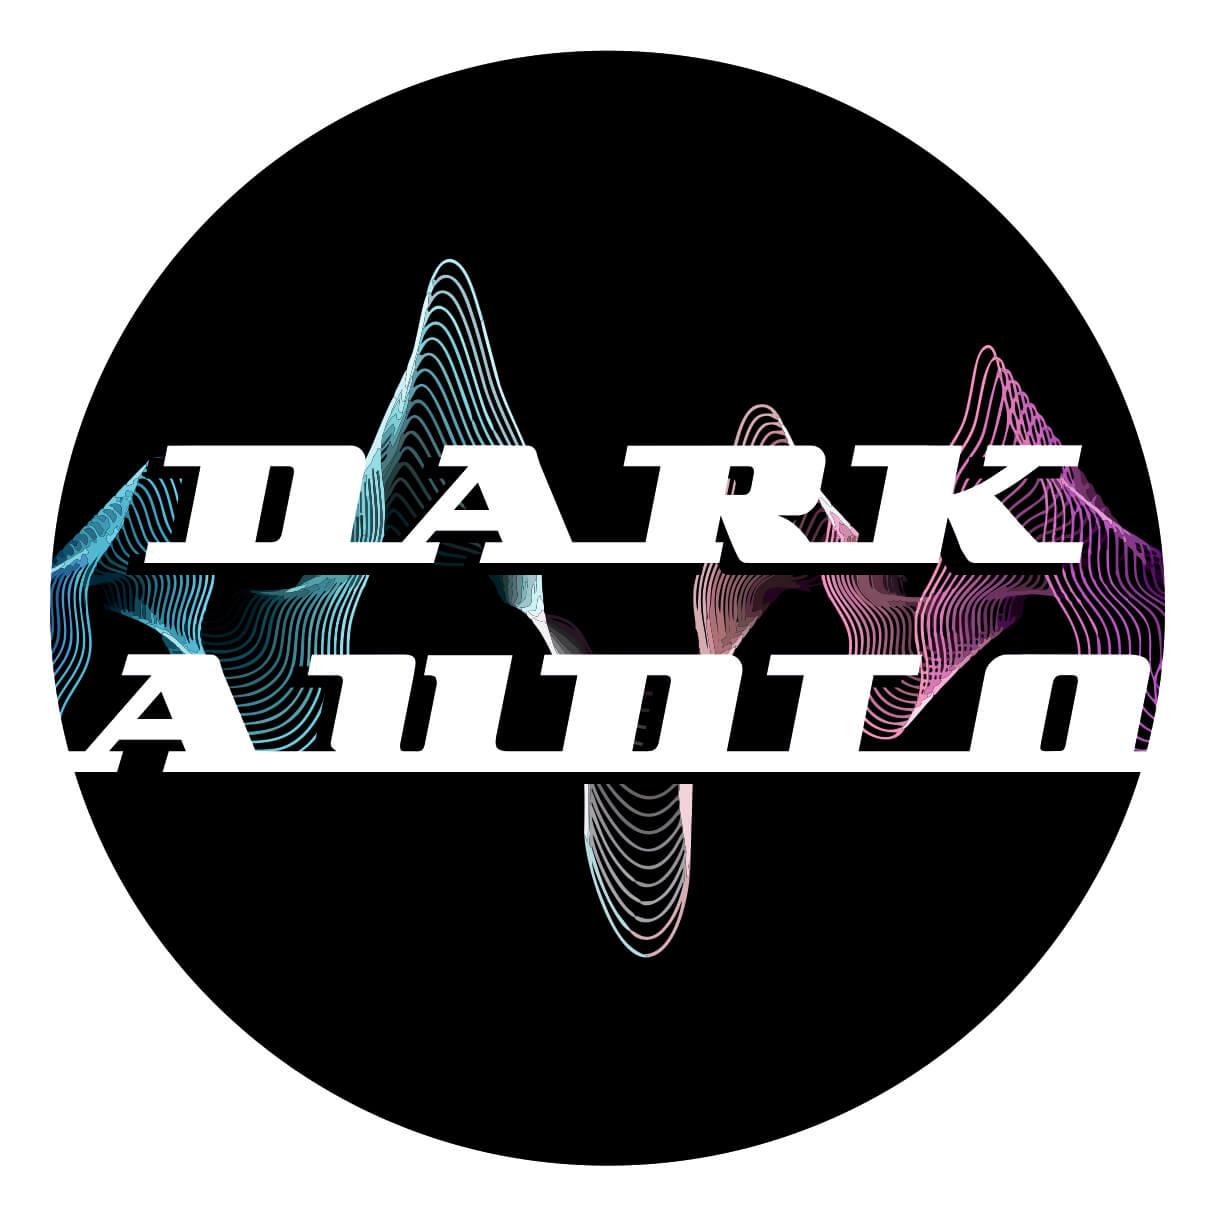 www.darkaudio.co.uk